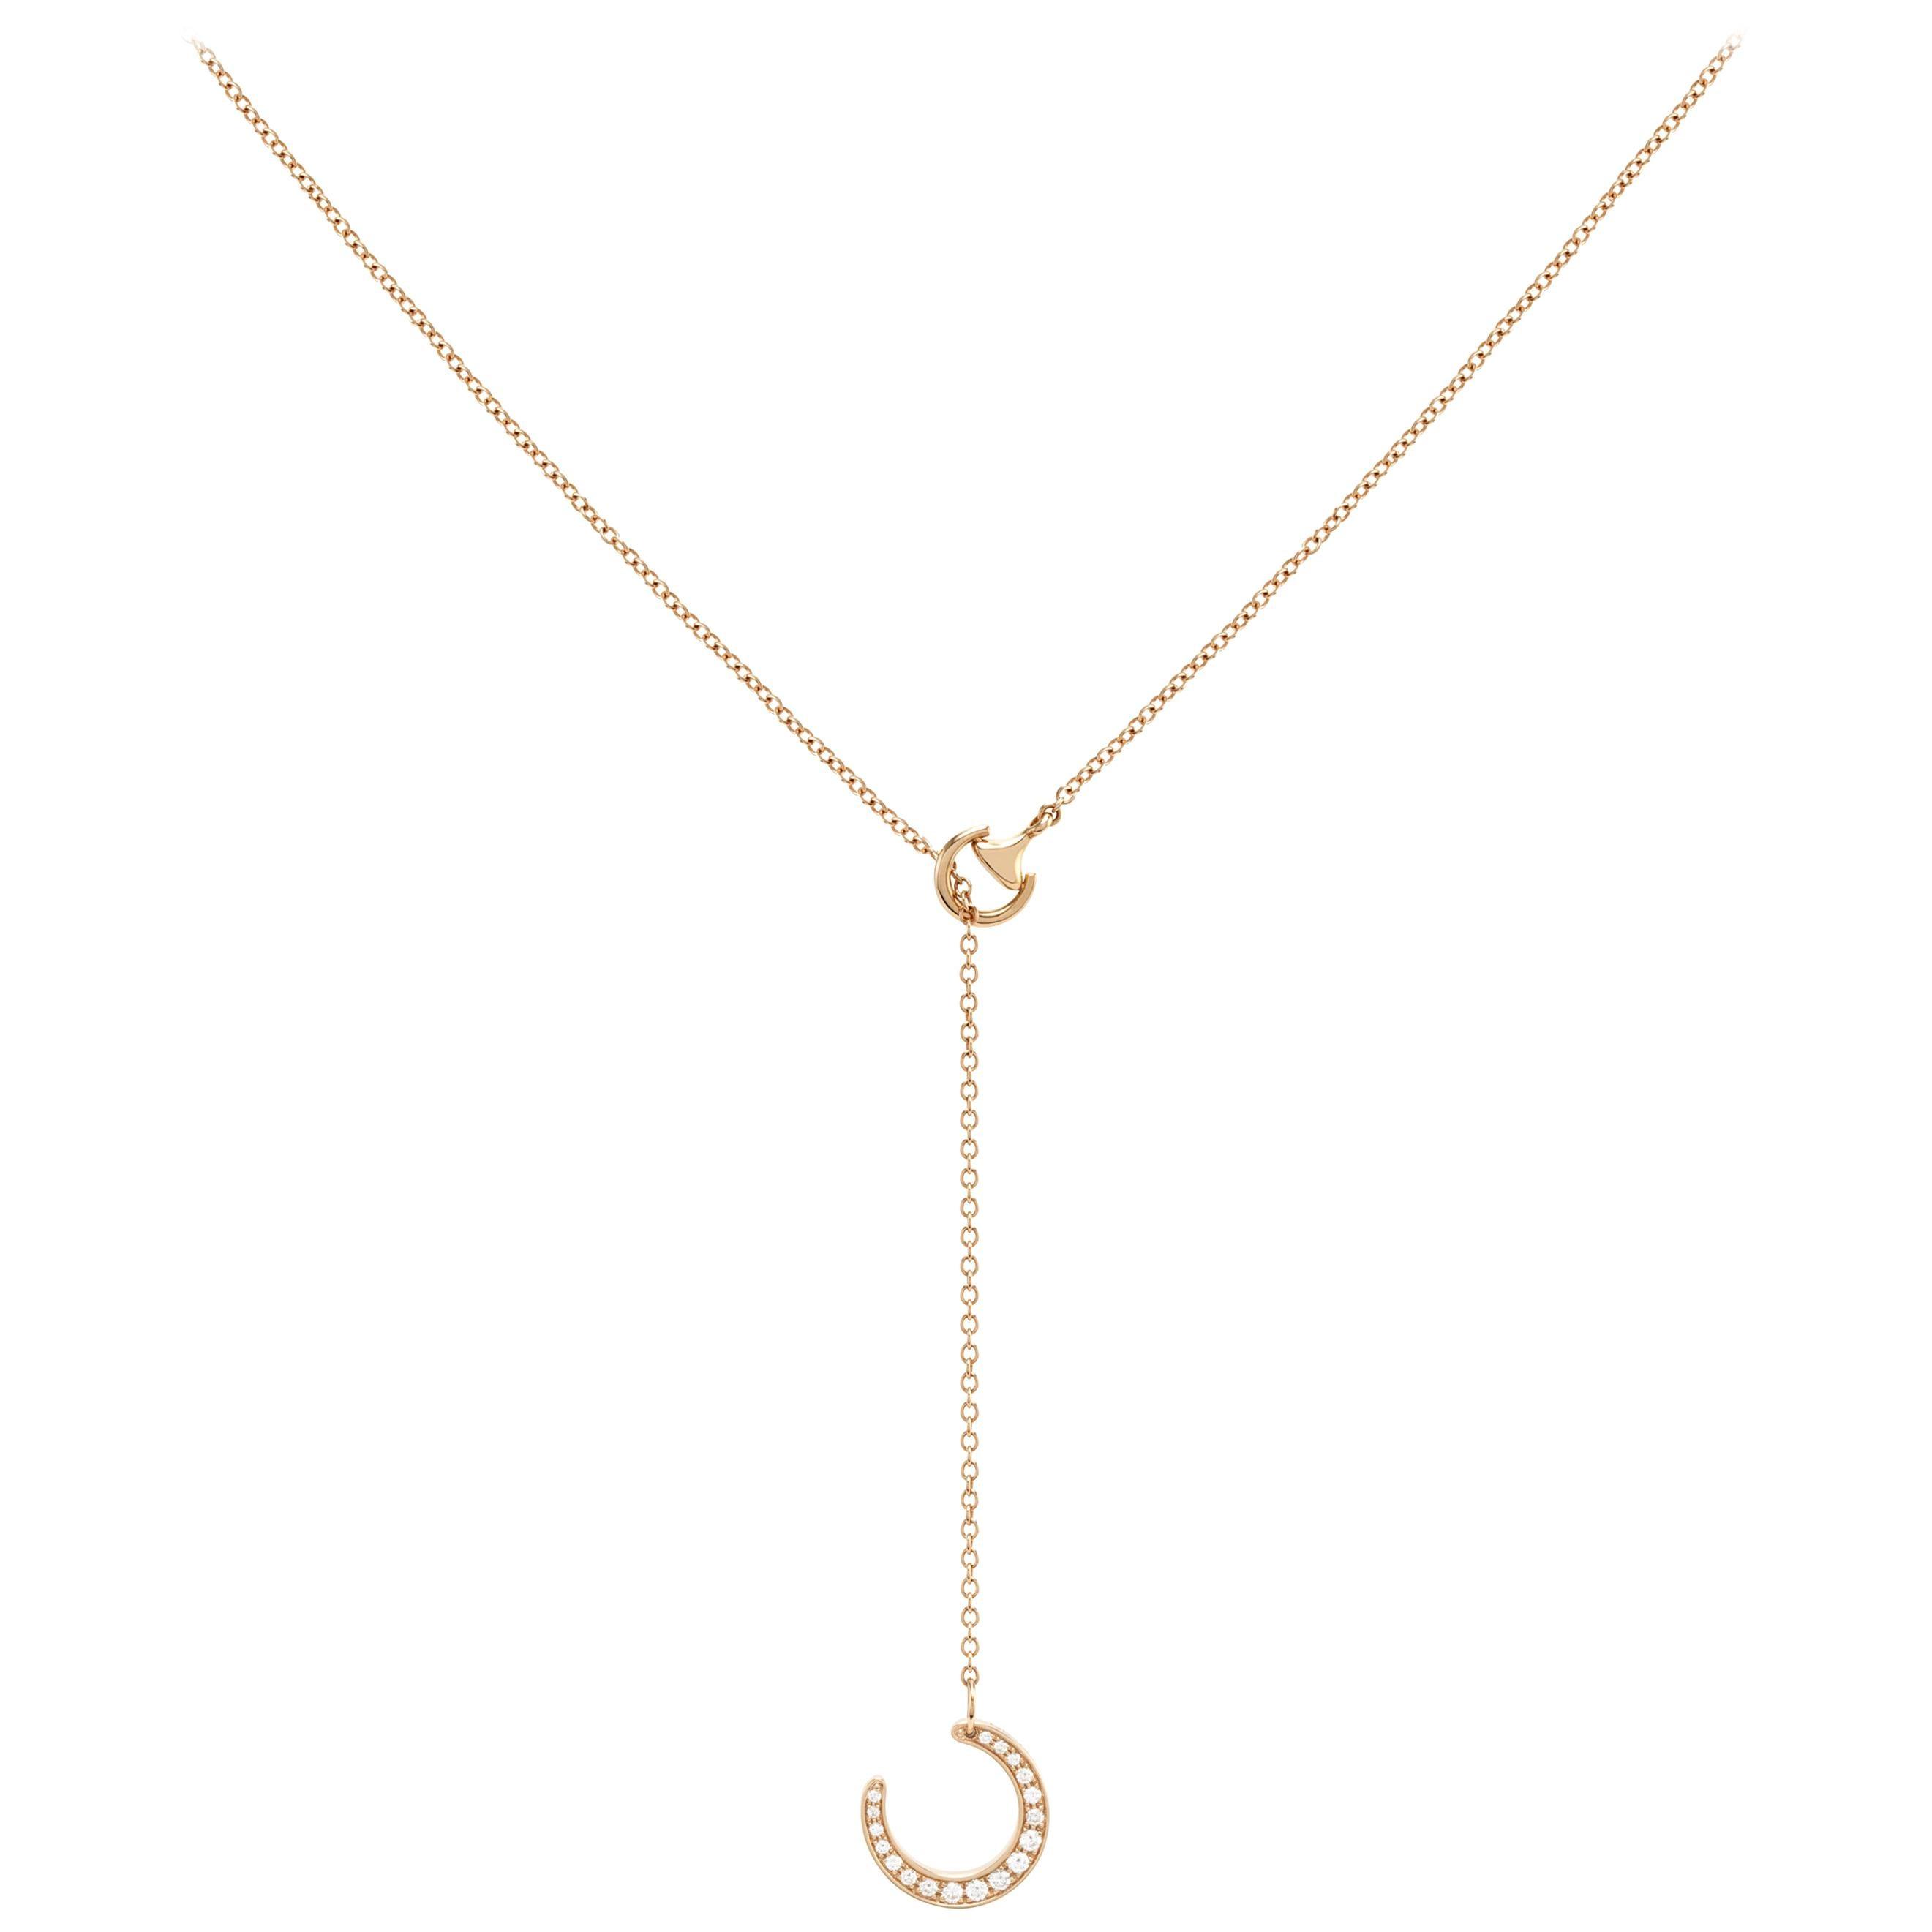 Ubaldi Gioielli 18 Kt Gold Equestrian Horseshoe Necklace Pendant Diamonds Pave